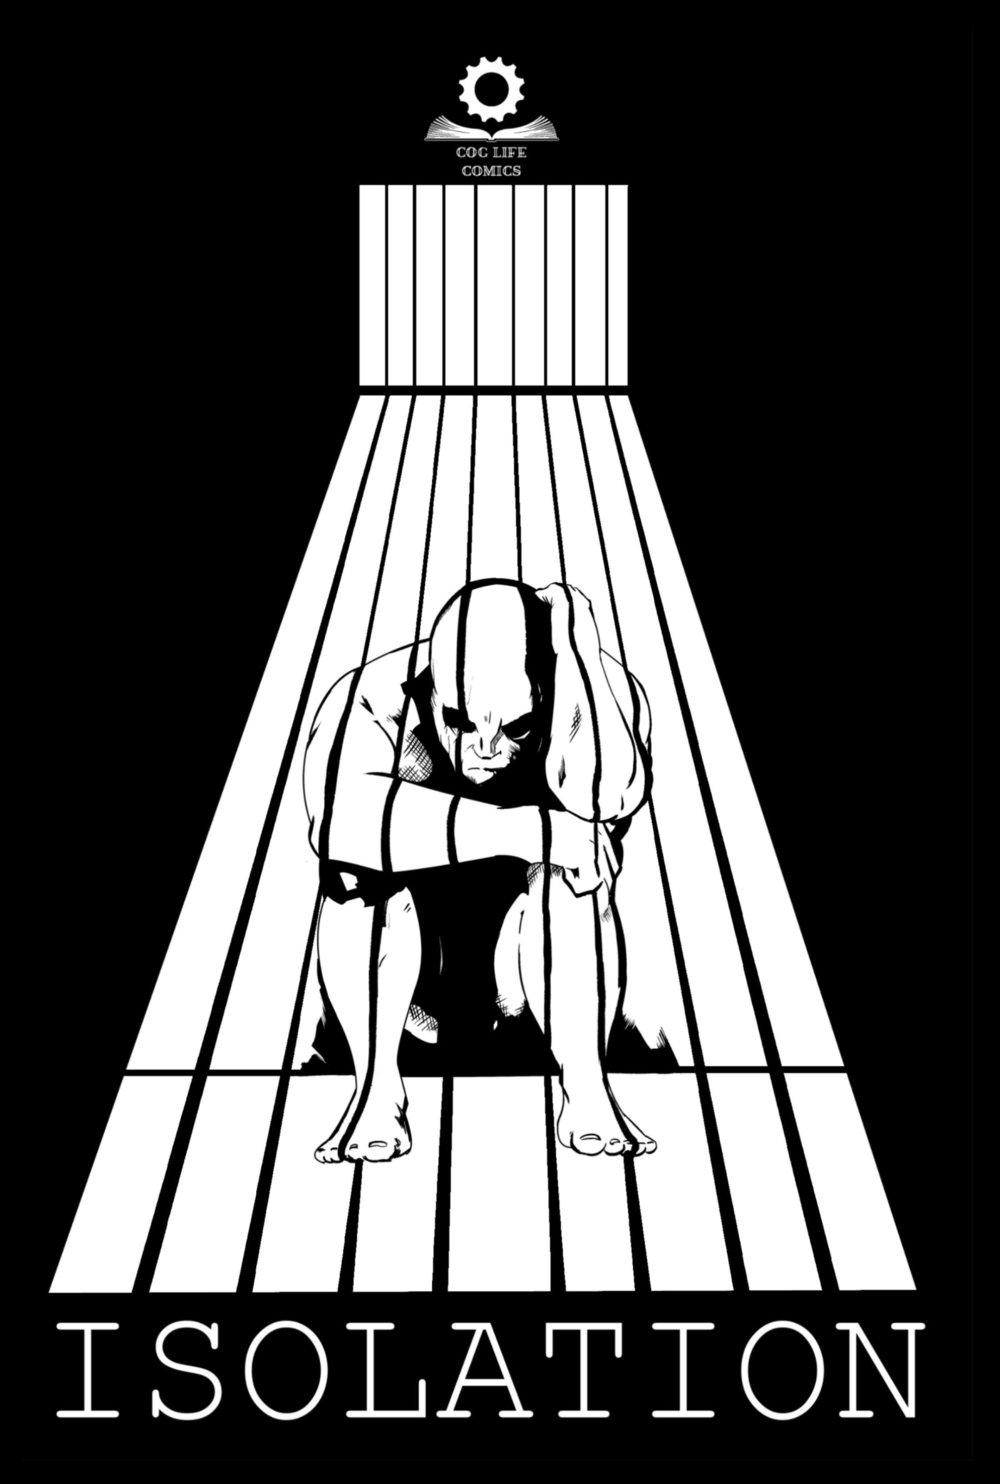 Cog-Life-Isolation.jpg